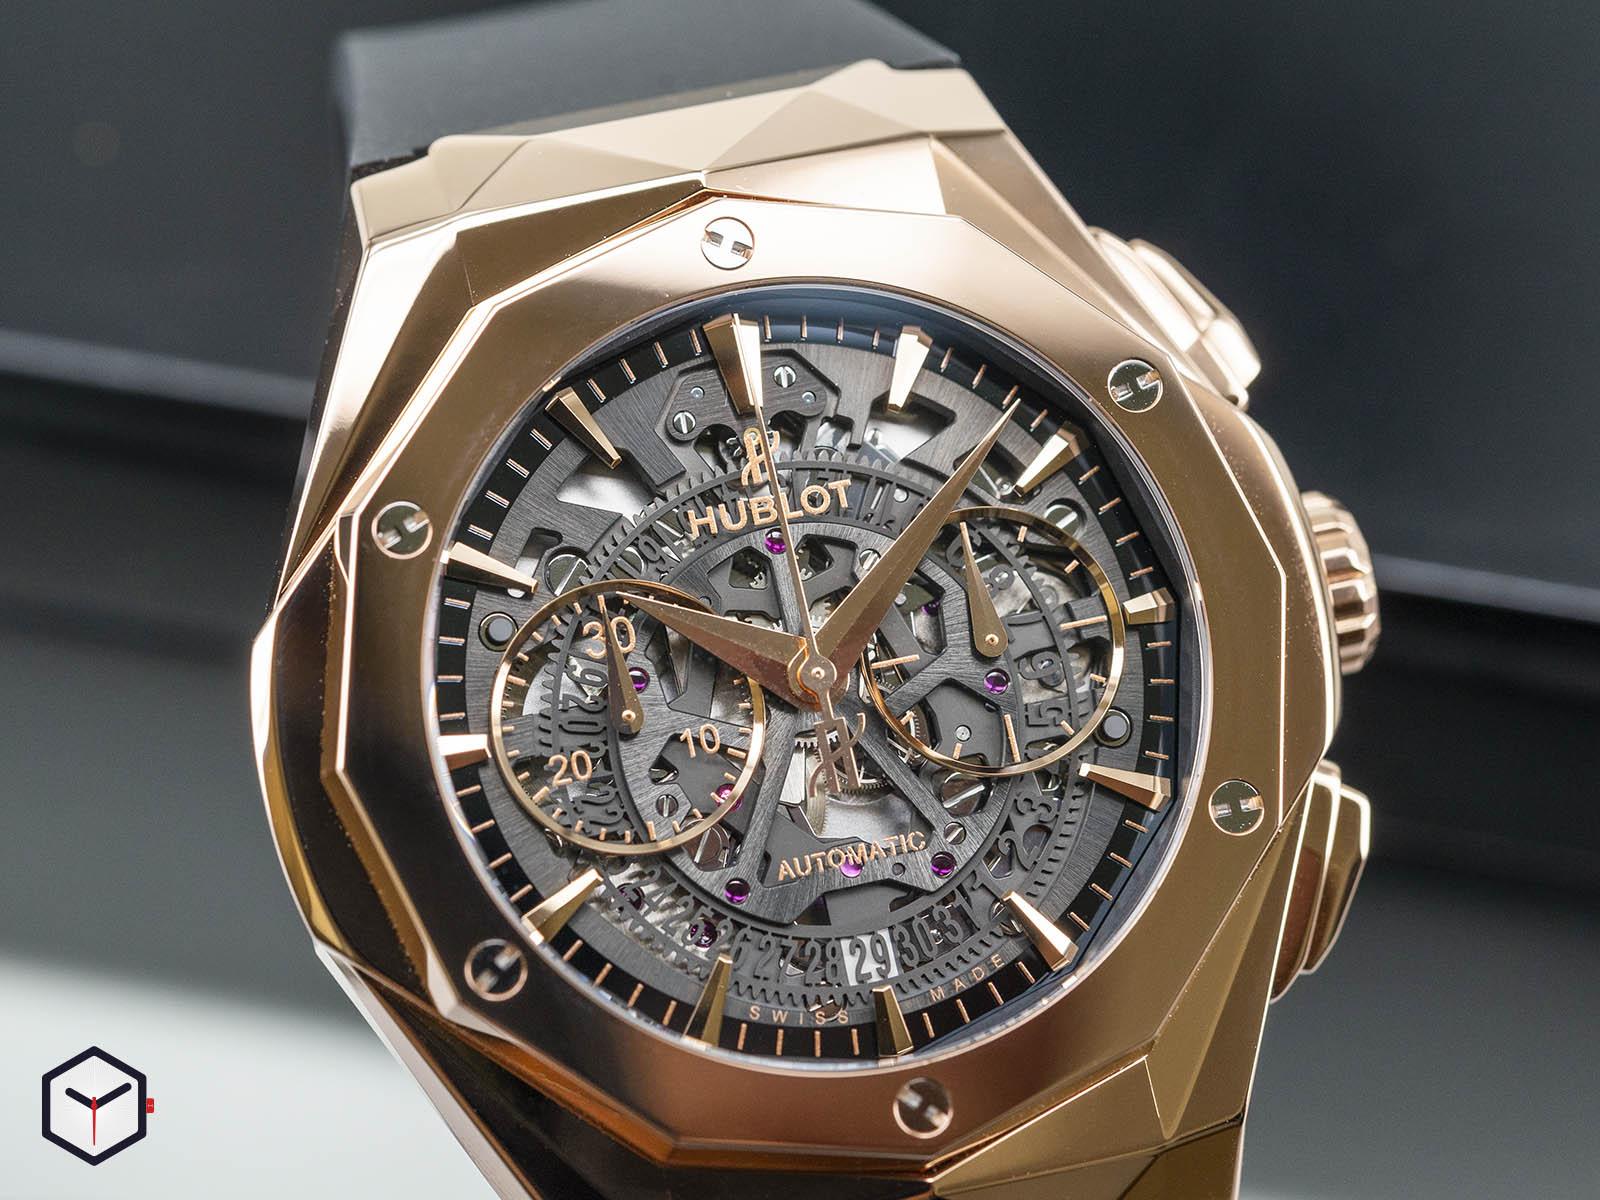 525-ox-0180-rx-orl18-hublot-classic-fusion-aerofusion-chronograph-orlinski-king-gold-2.jpg